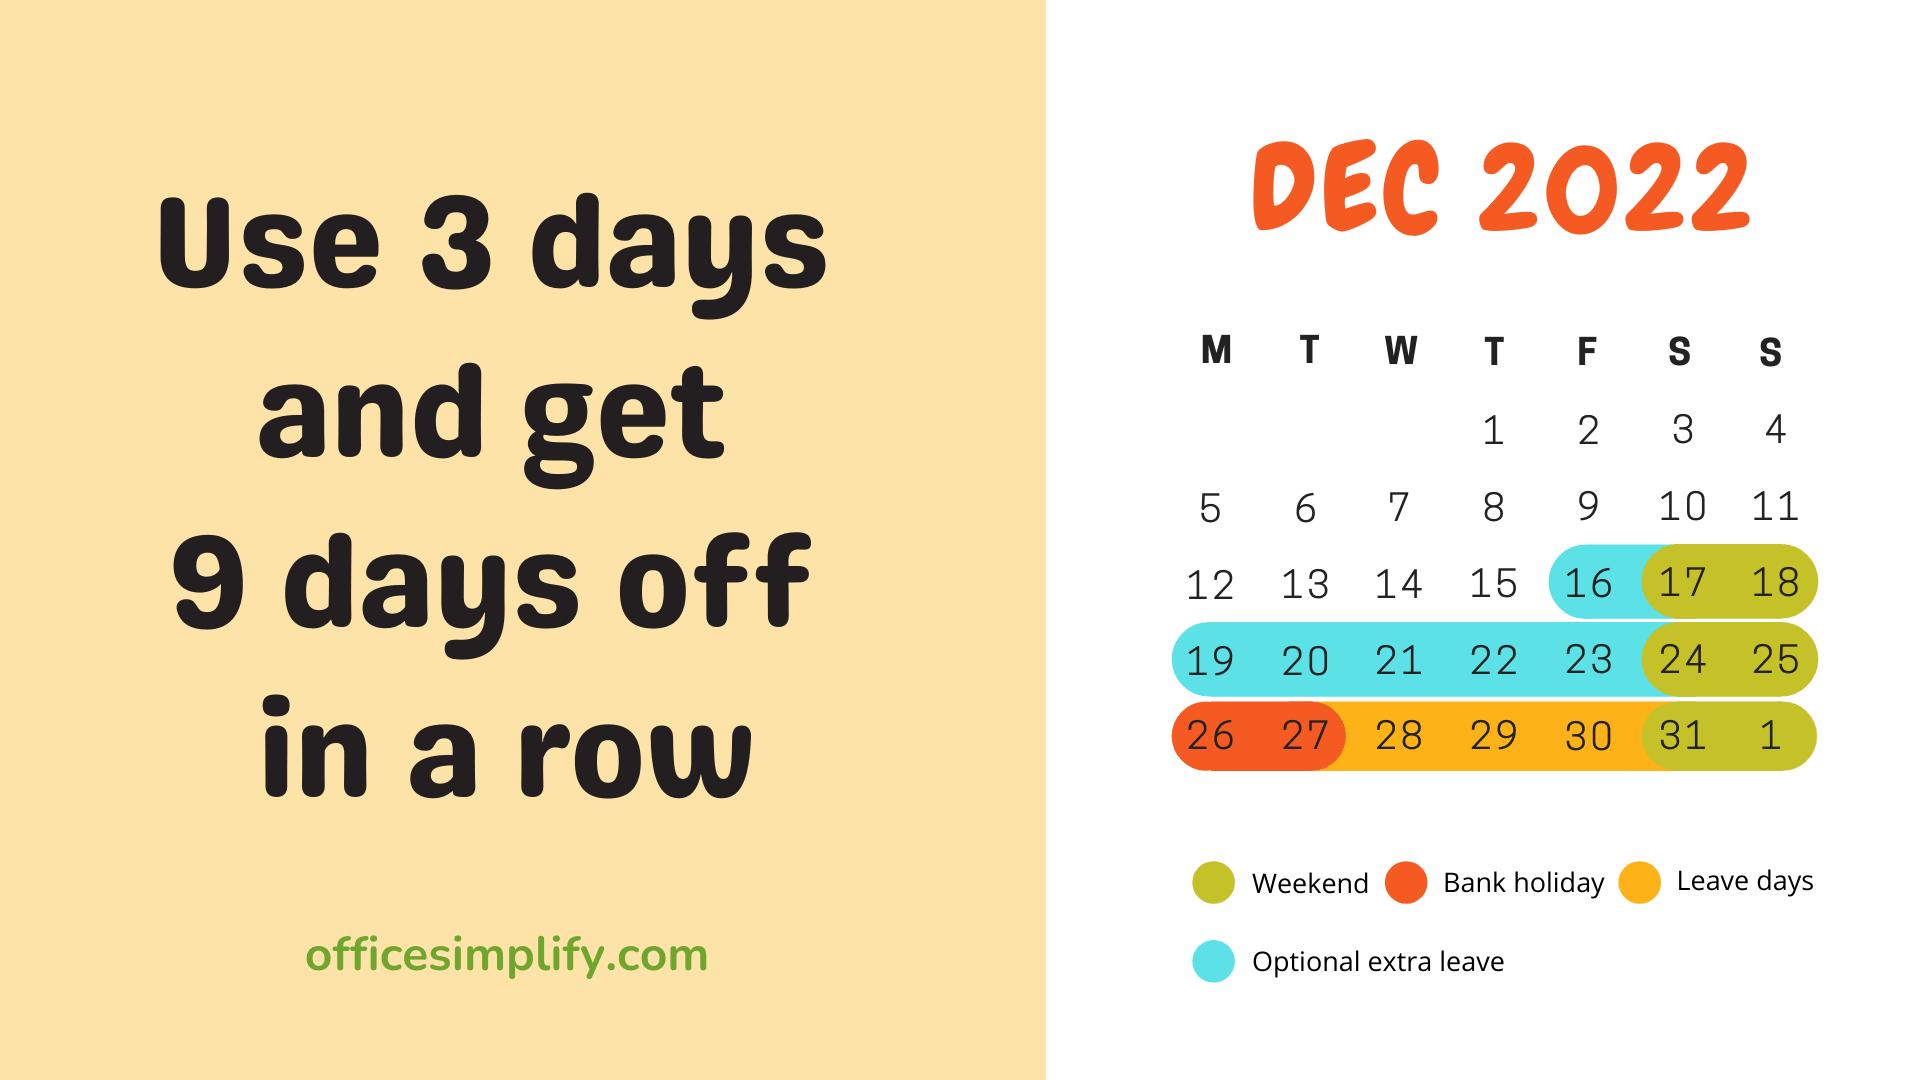 December 2022 employee leave plan